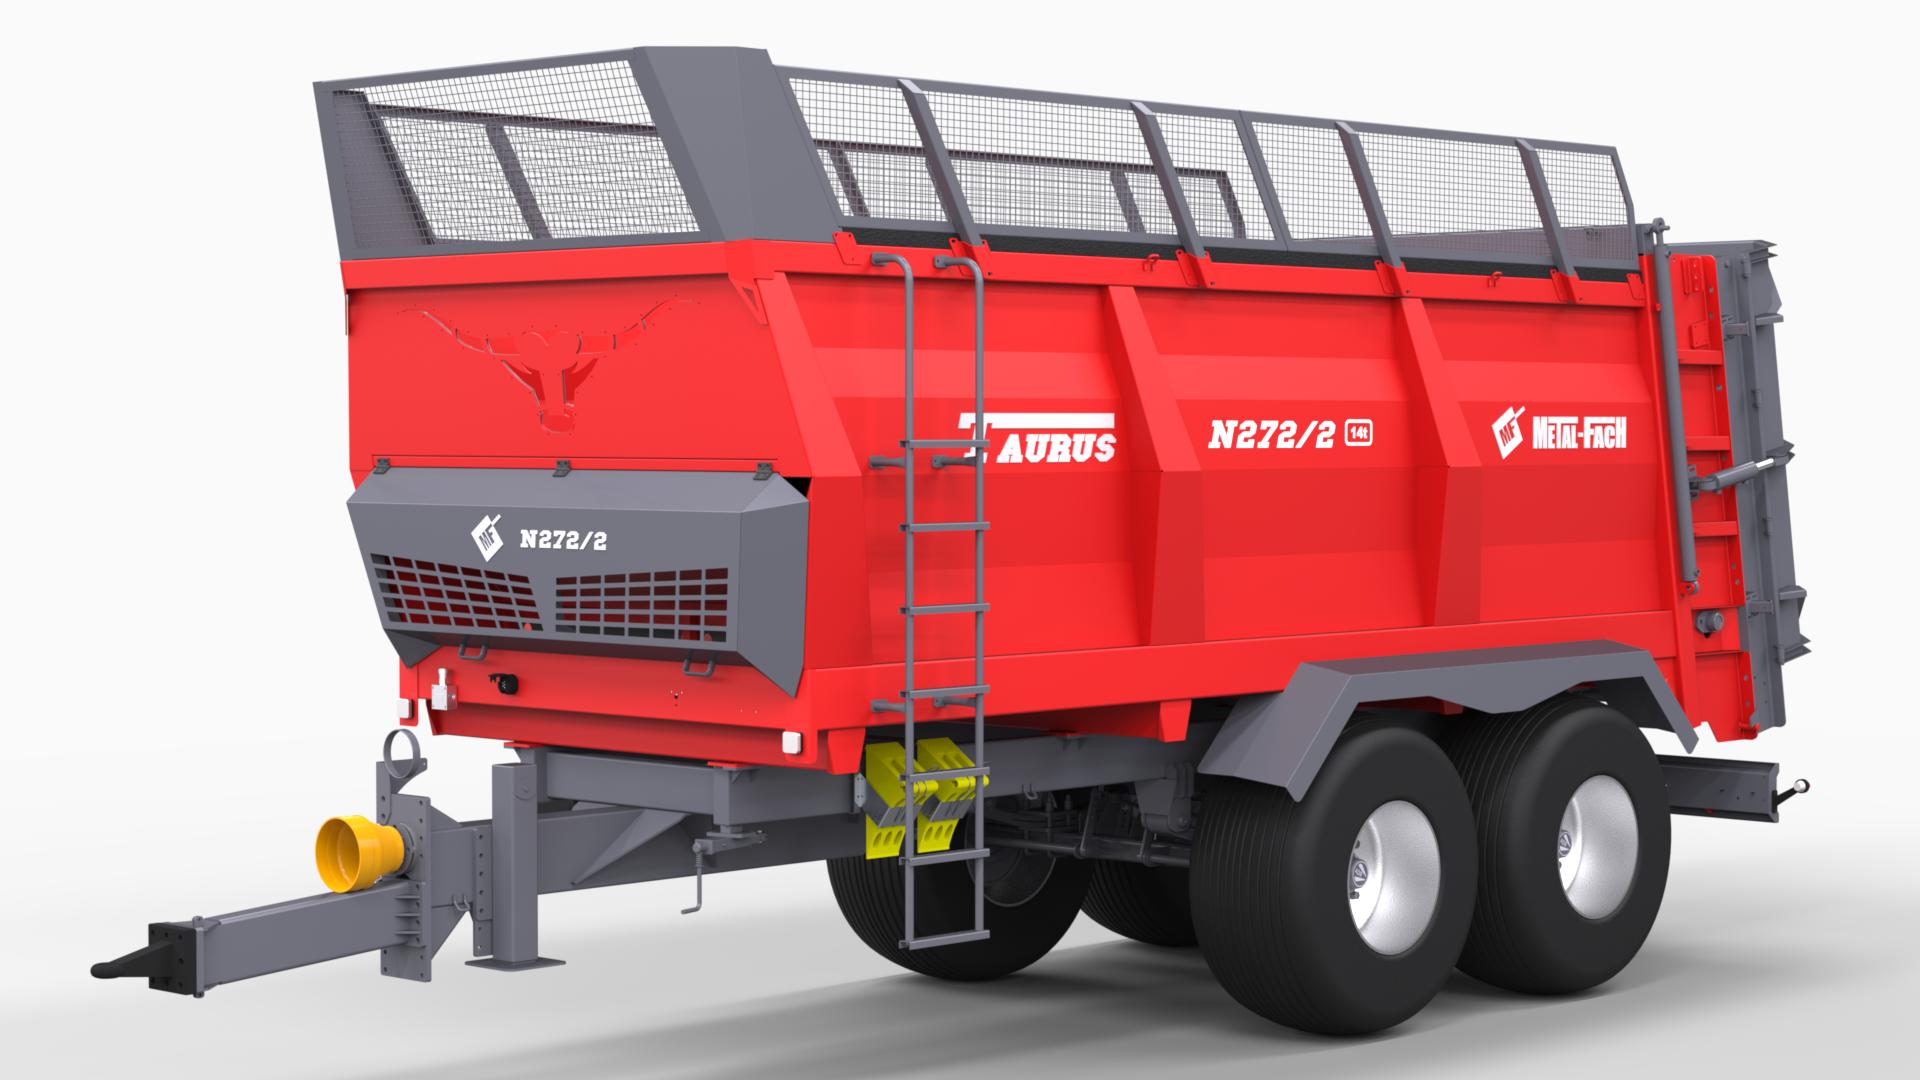 Manure Spreader N272/2 Taurus